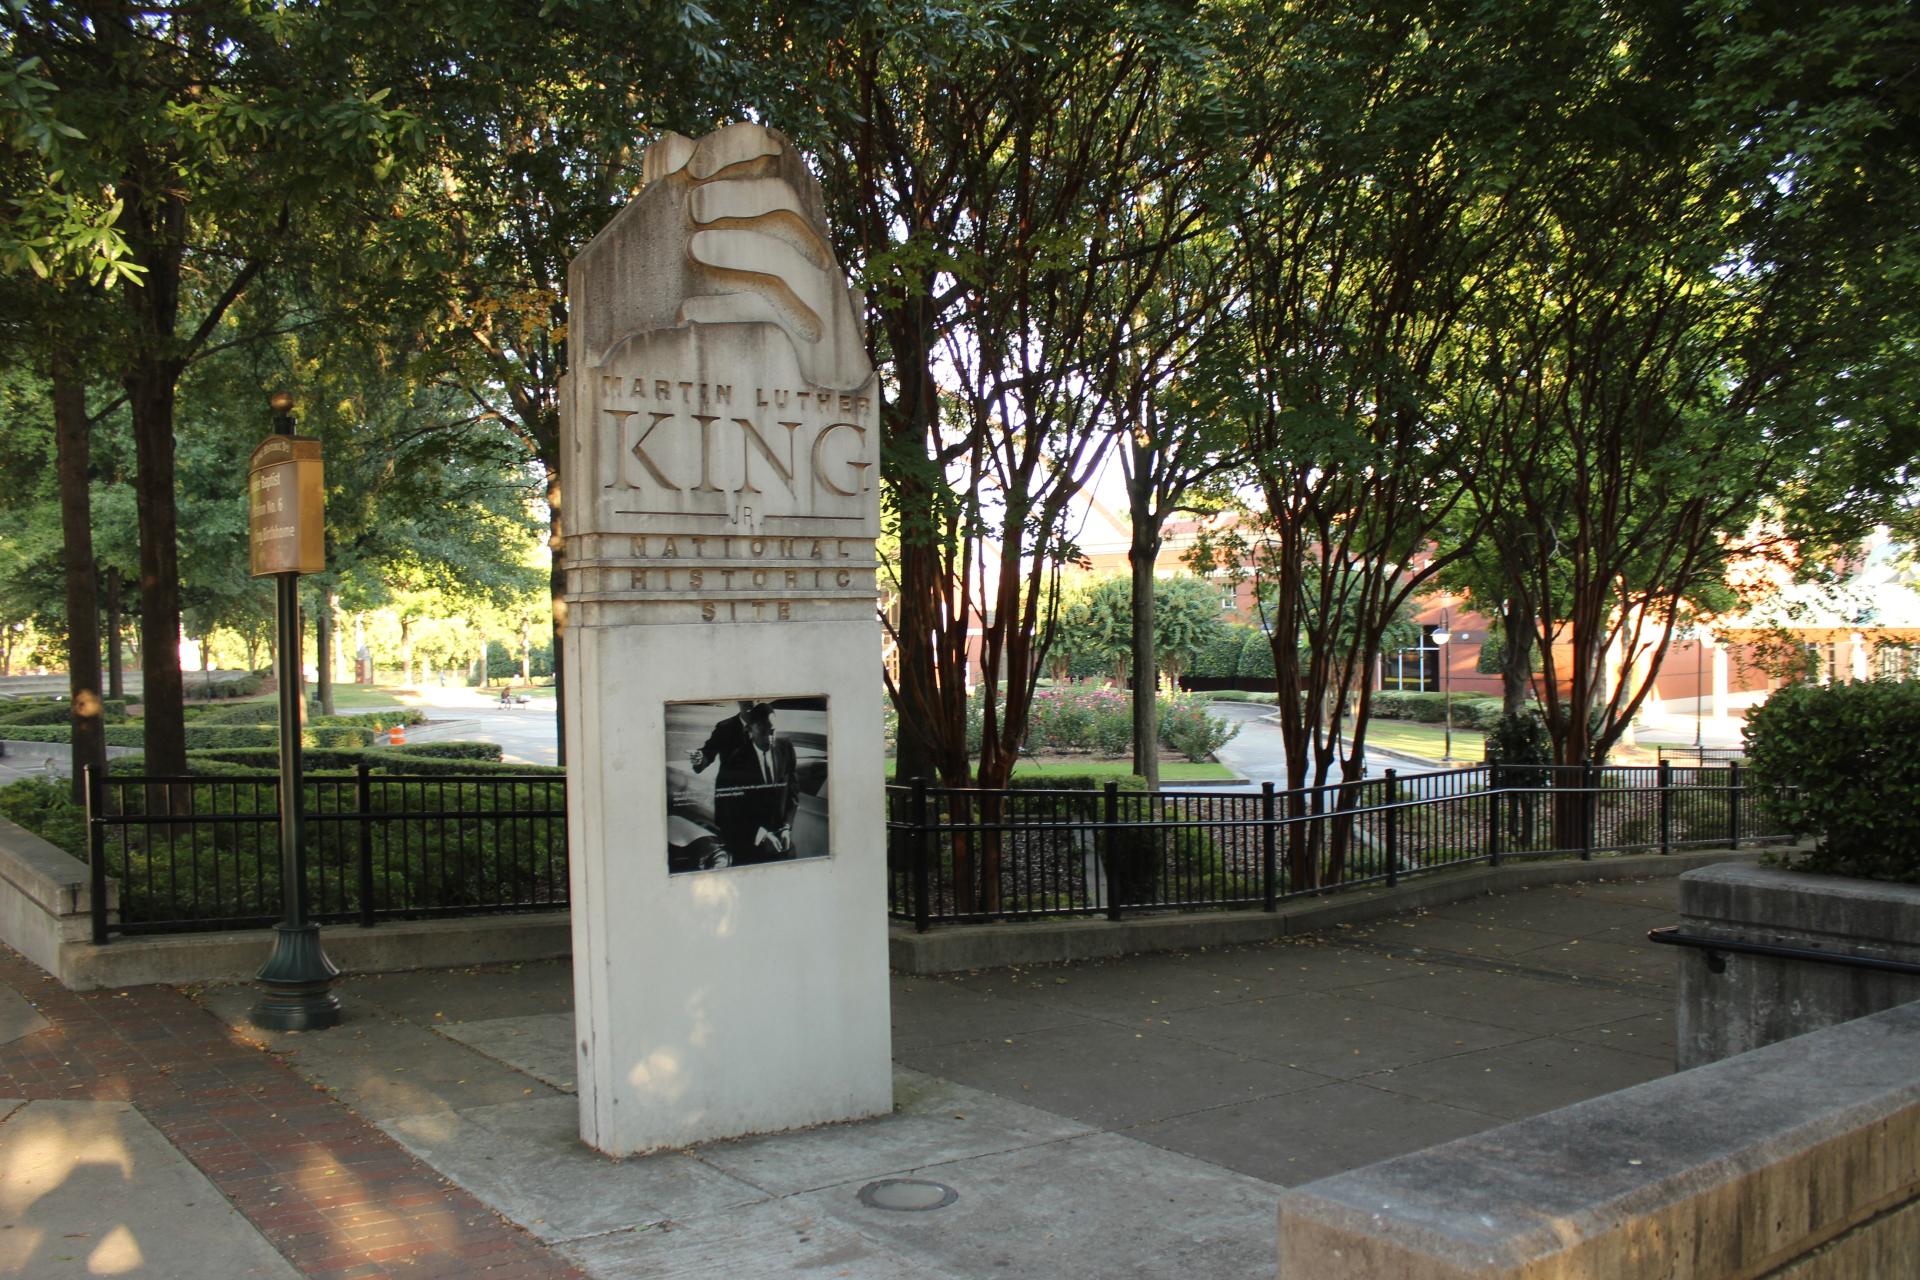 2018 Southeast Visit, Part 1: Exploring Around Atlanta